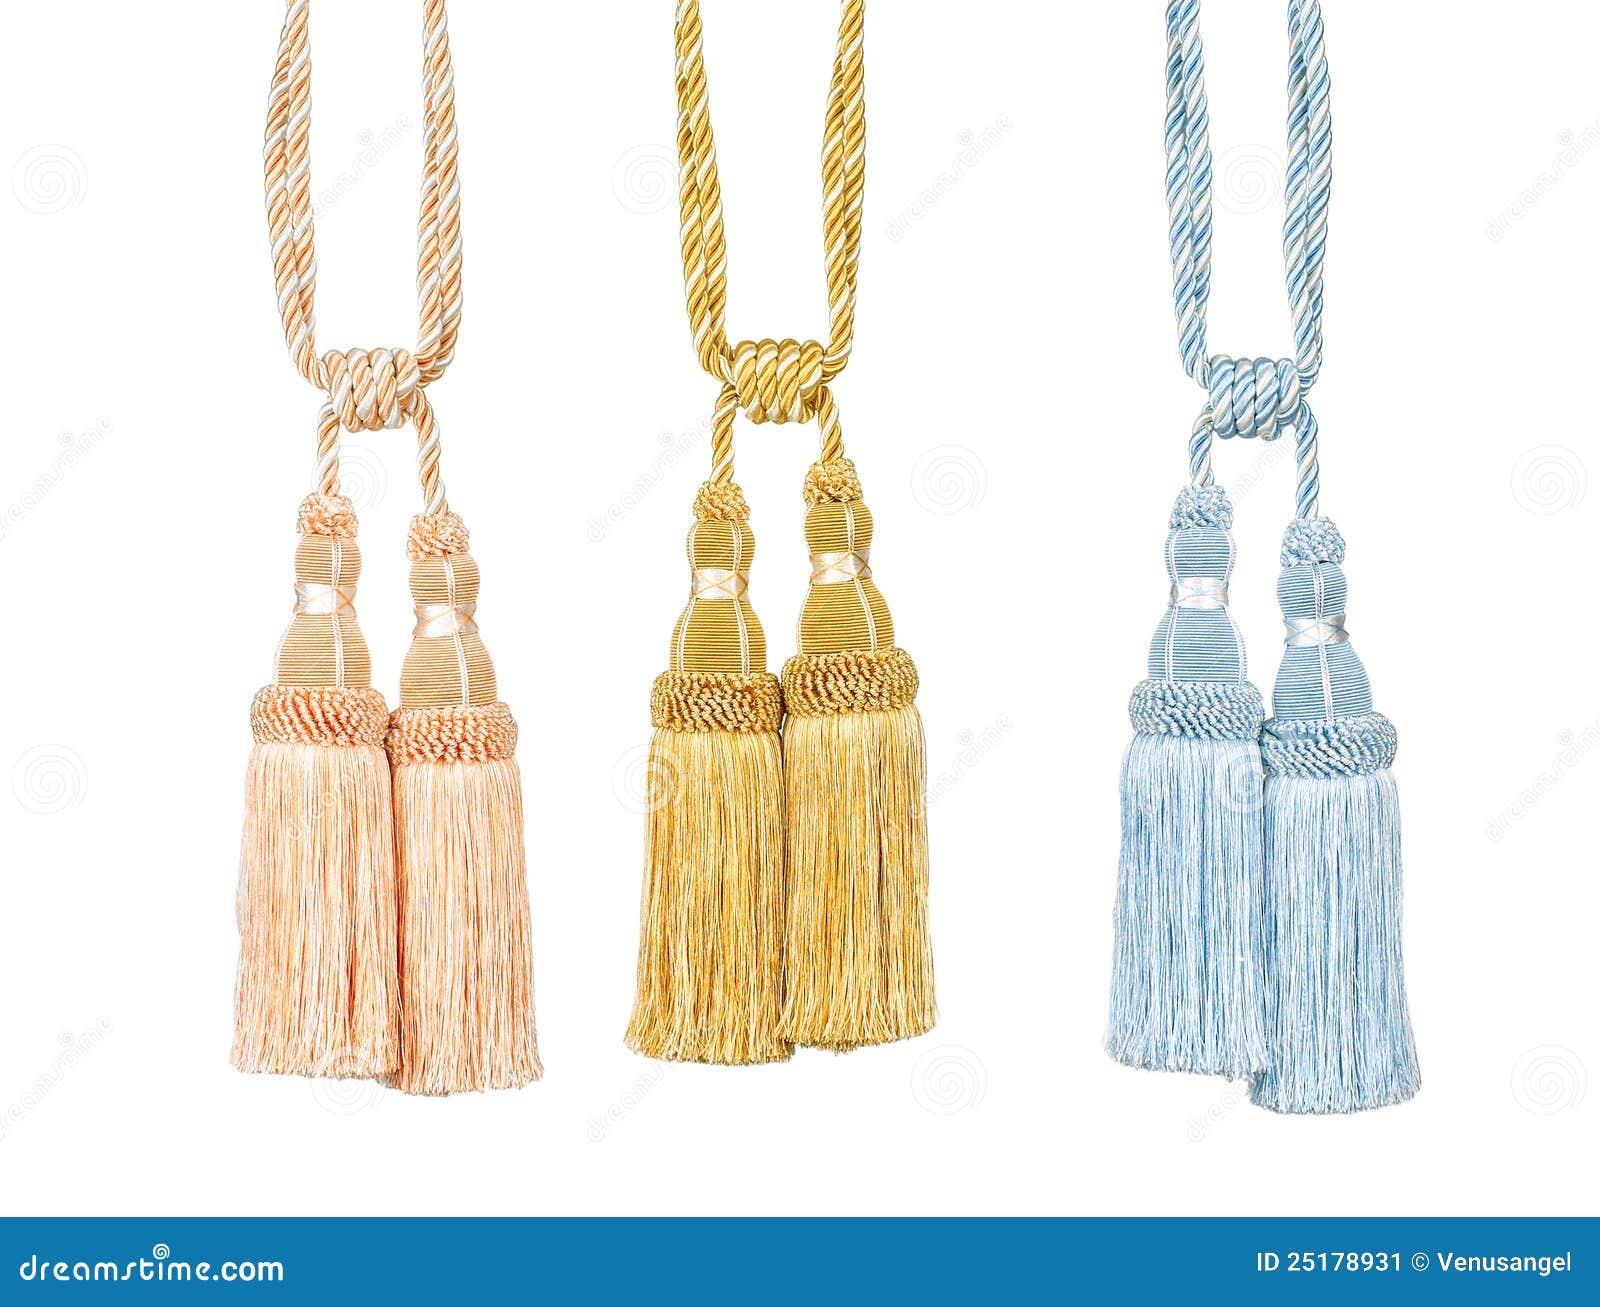 Curtain Tassels Stock Image Image Of Luxury Hanging